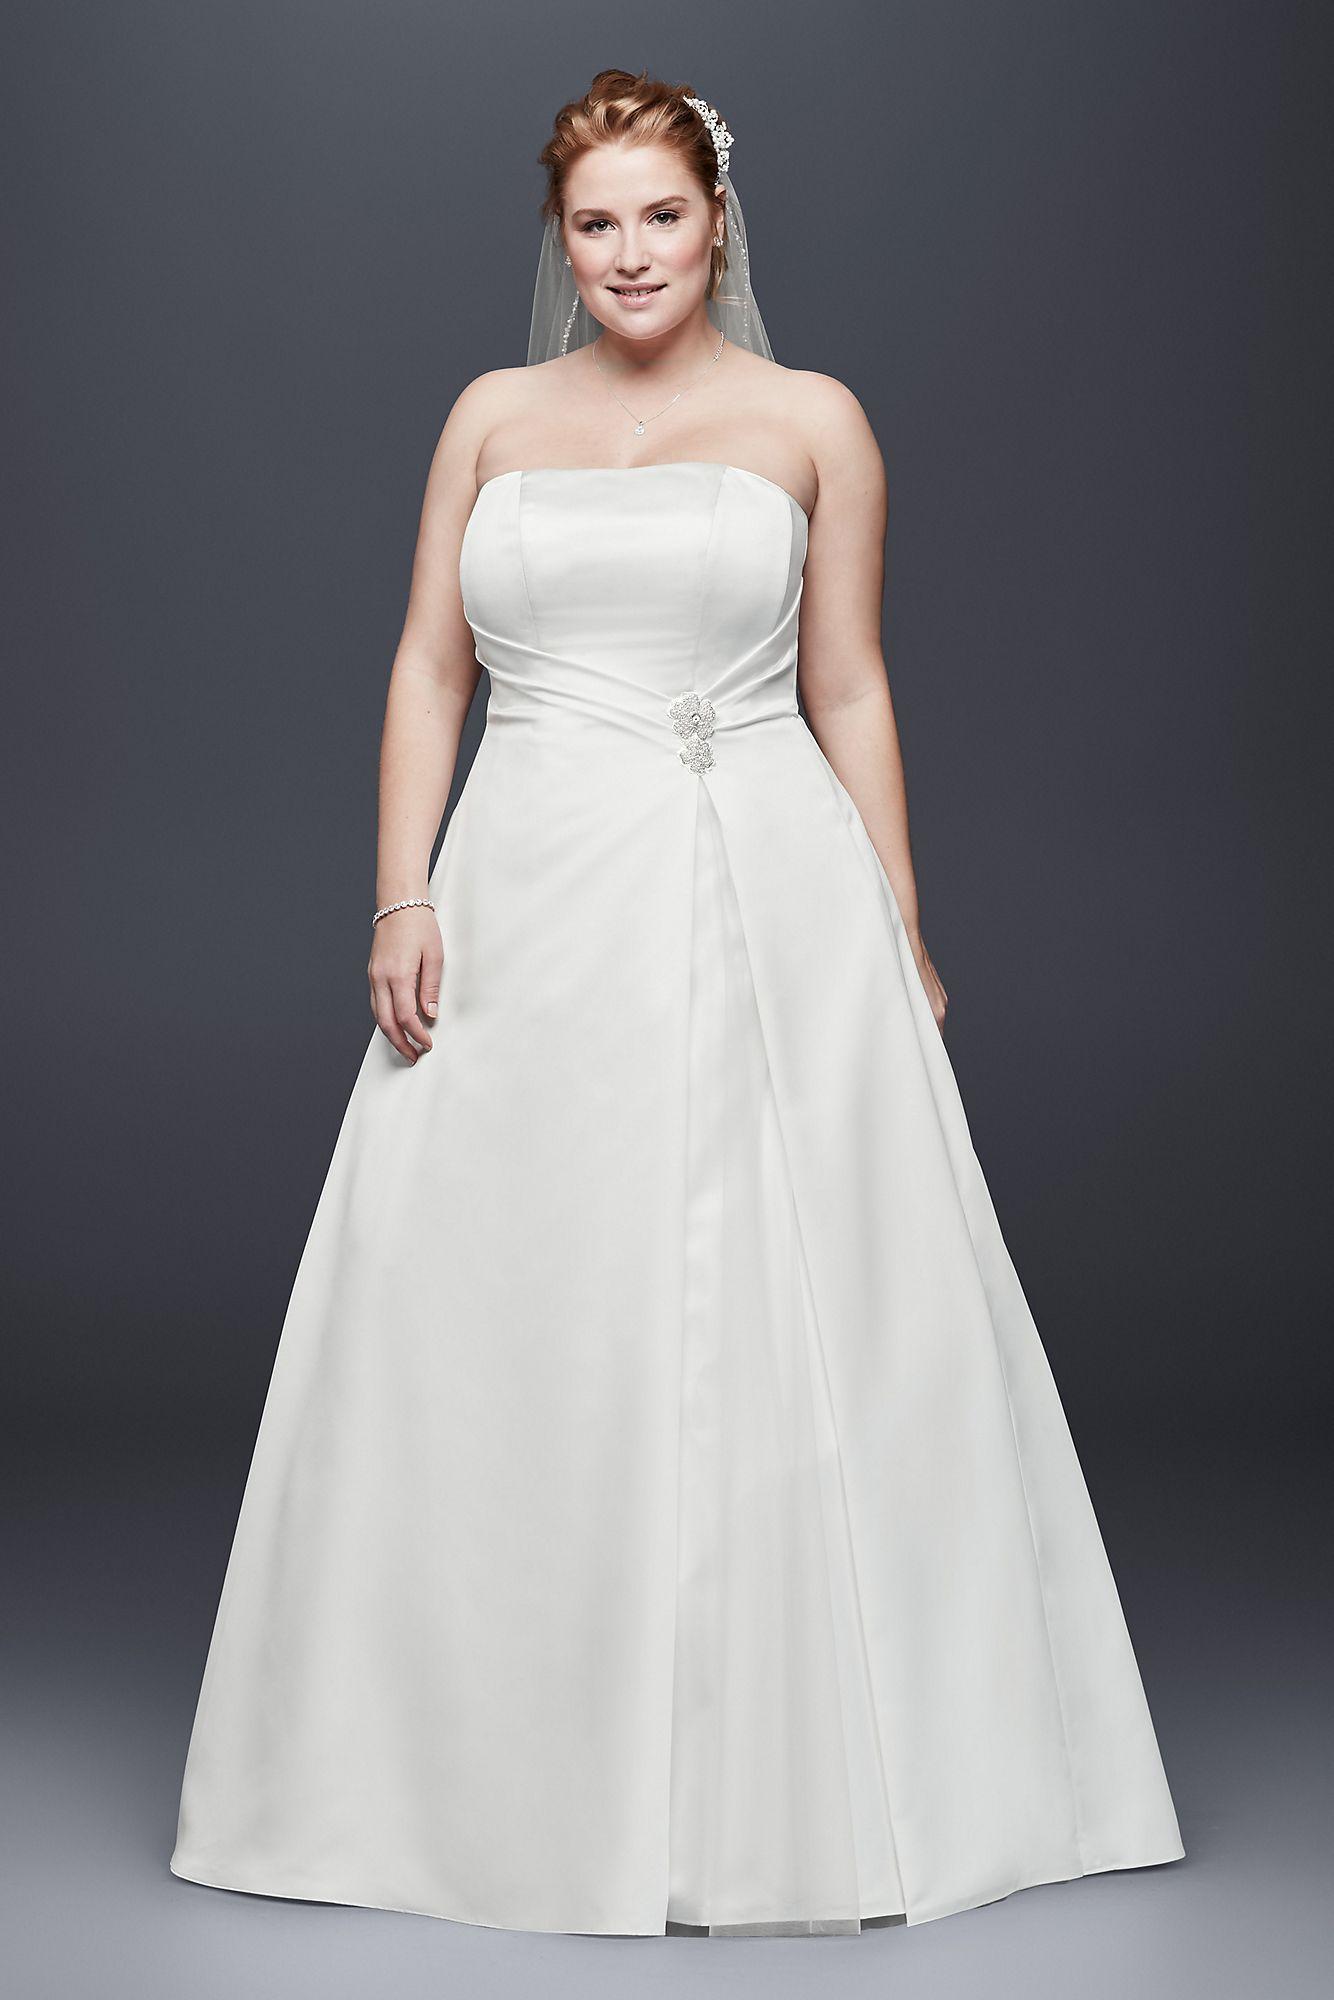 Plus size wedding dress designers  Satin Plus Size ALine Wedding Dress with Applique Style OP